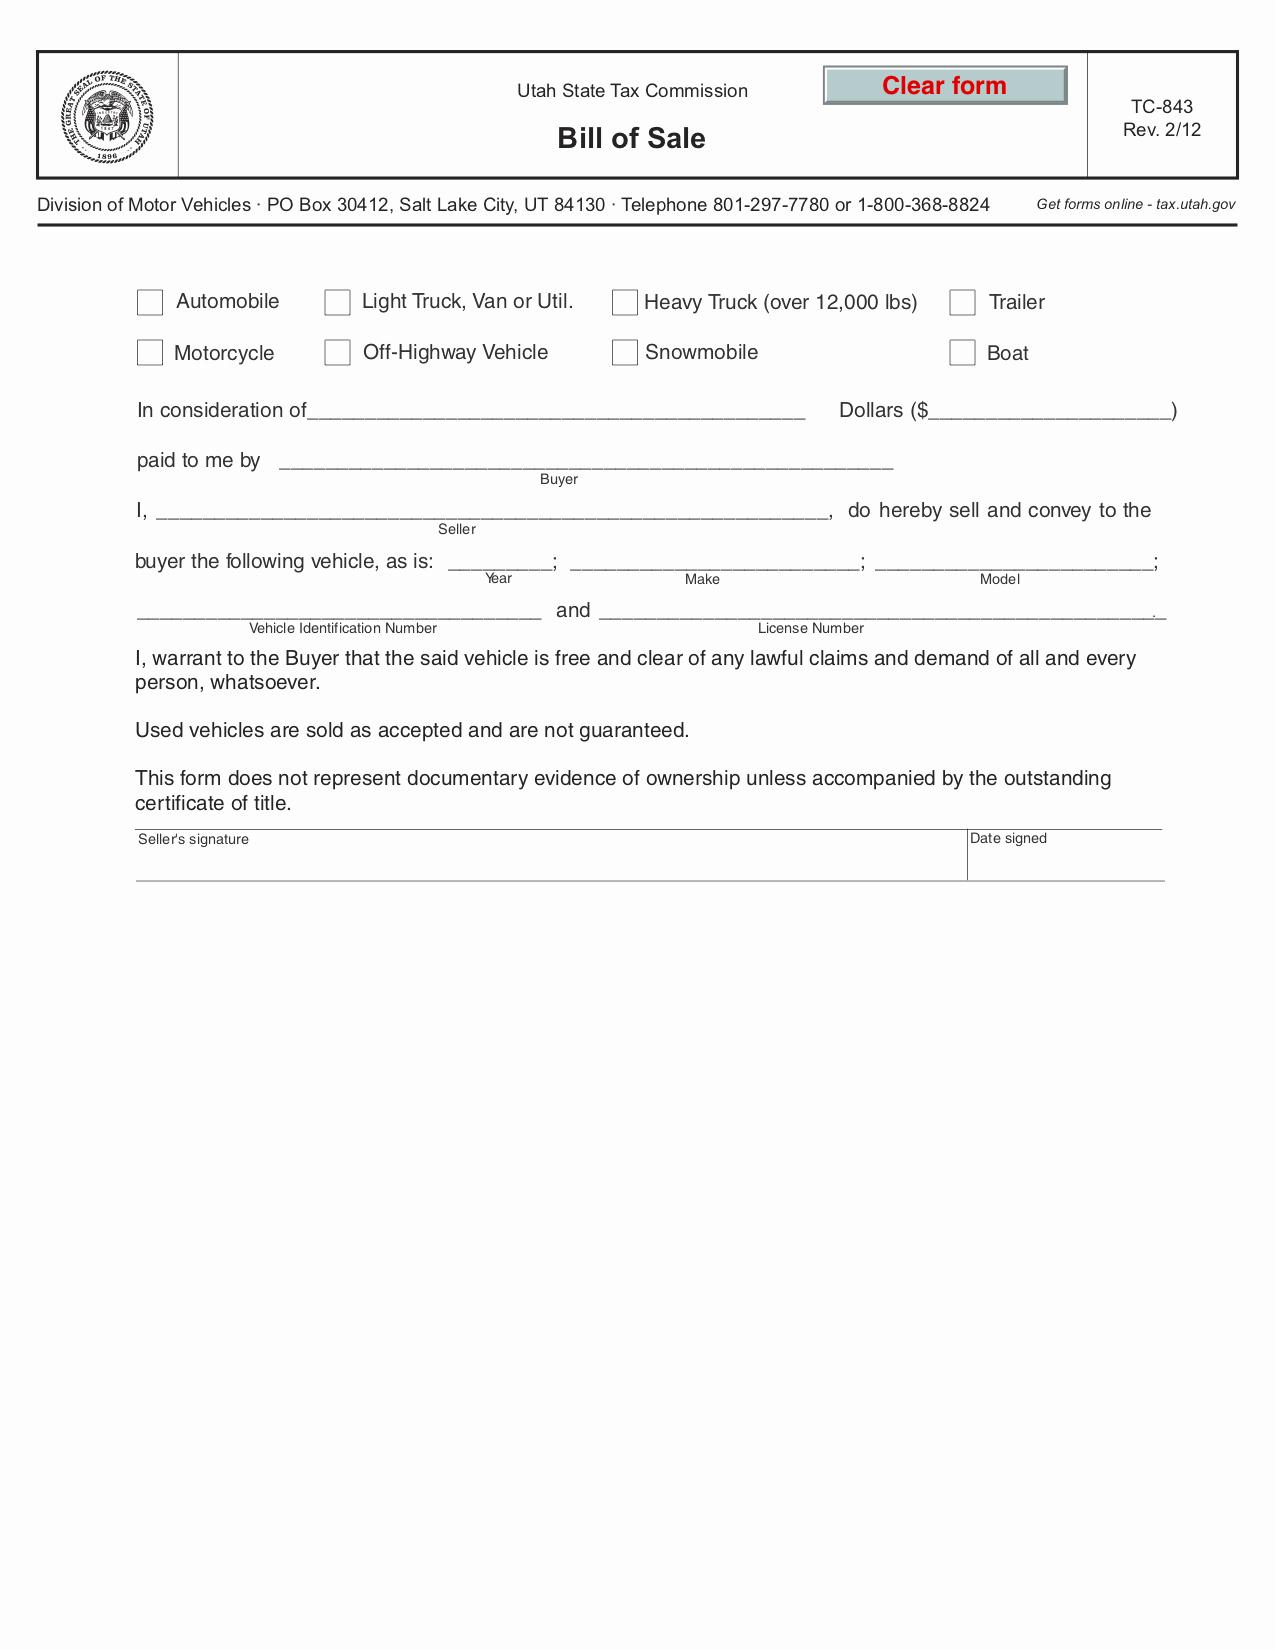 Template Bill Of Sale Car Inspirational Free Utah Bill Of Sale form Pdf Template